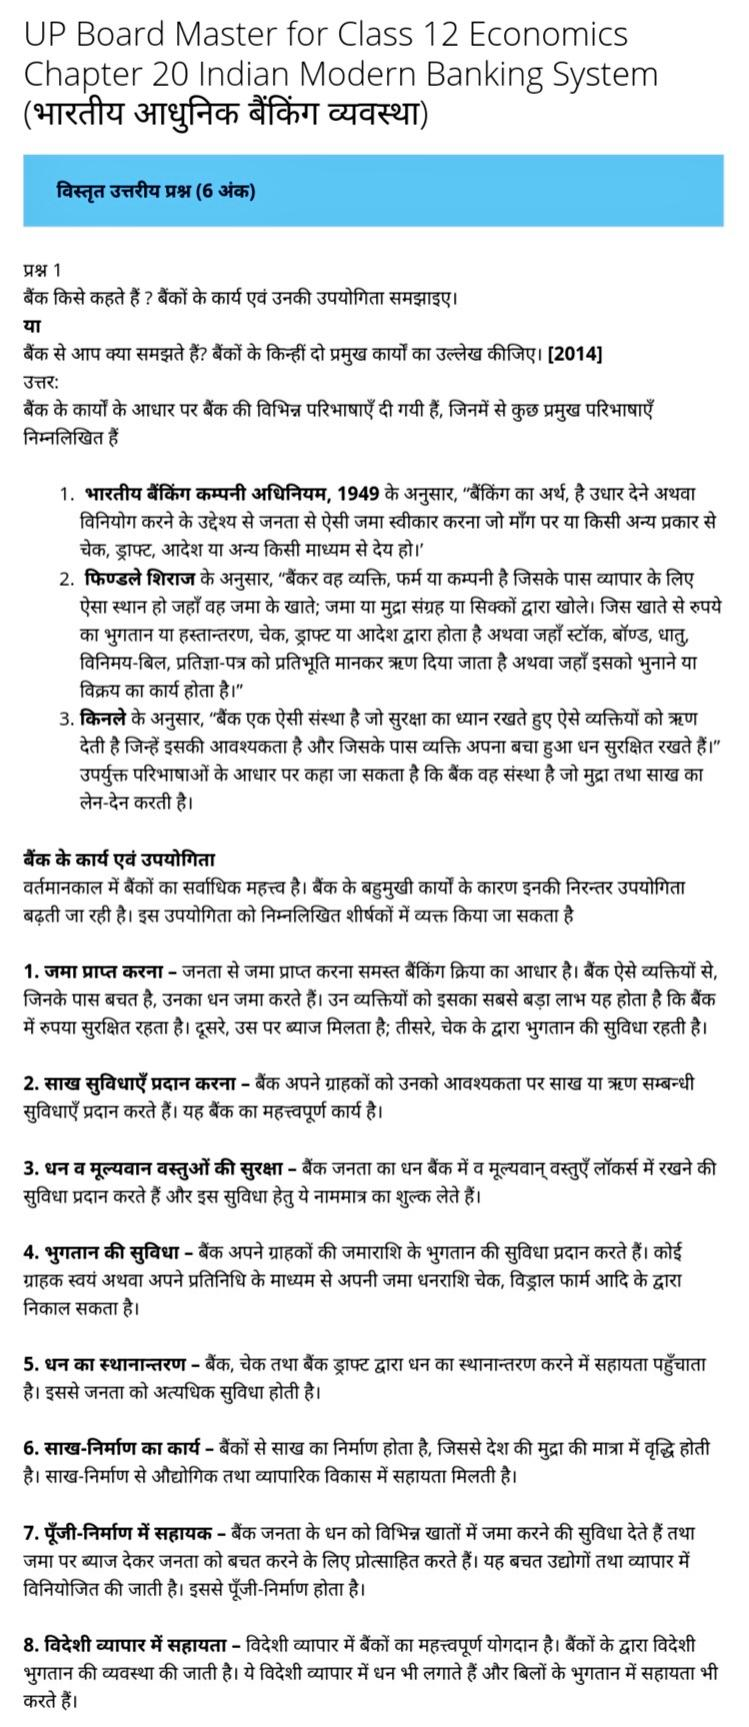 UP Board Solutions for Class 12 Economics Chapter 20 Indian Modern Banking System (भारतीय आधुनिक बैंकिंग व्यवस्था)